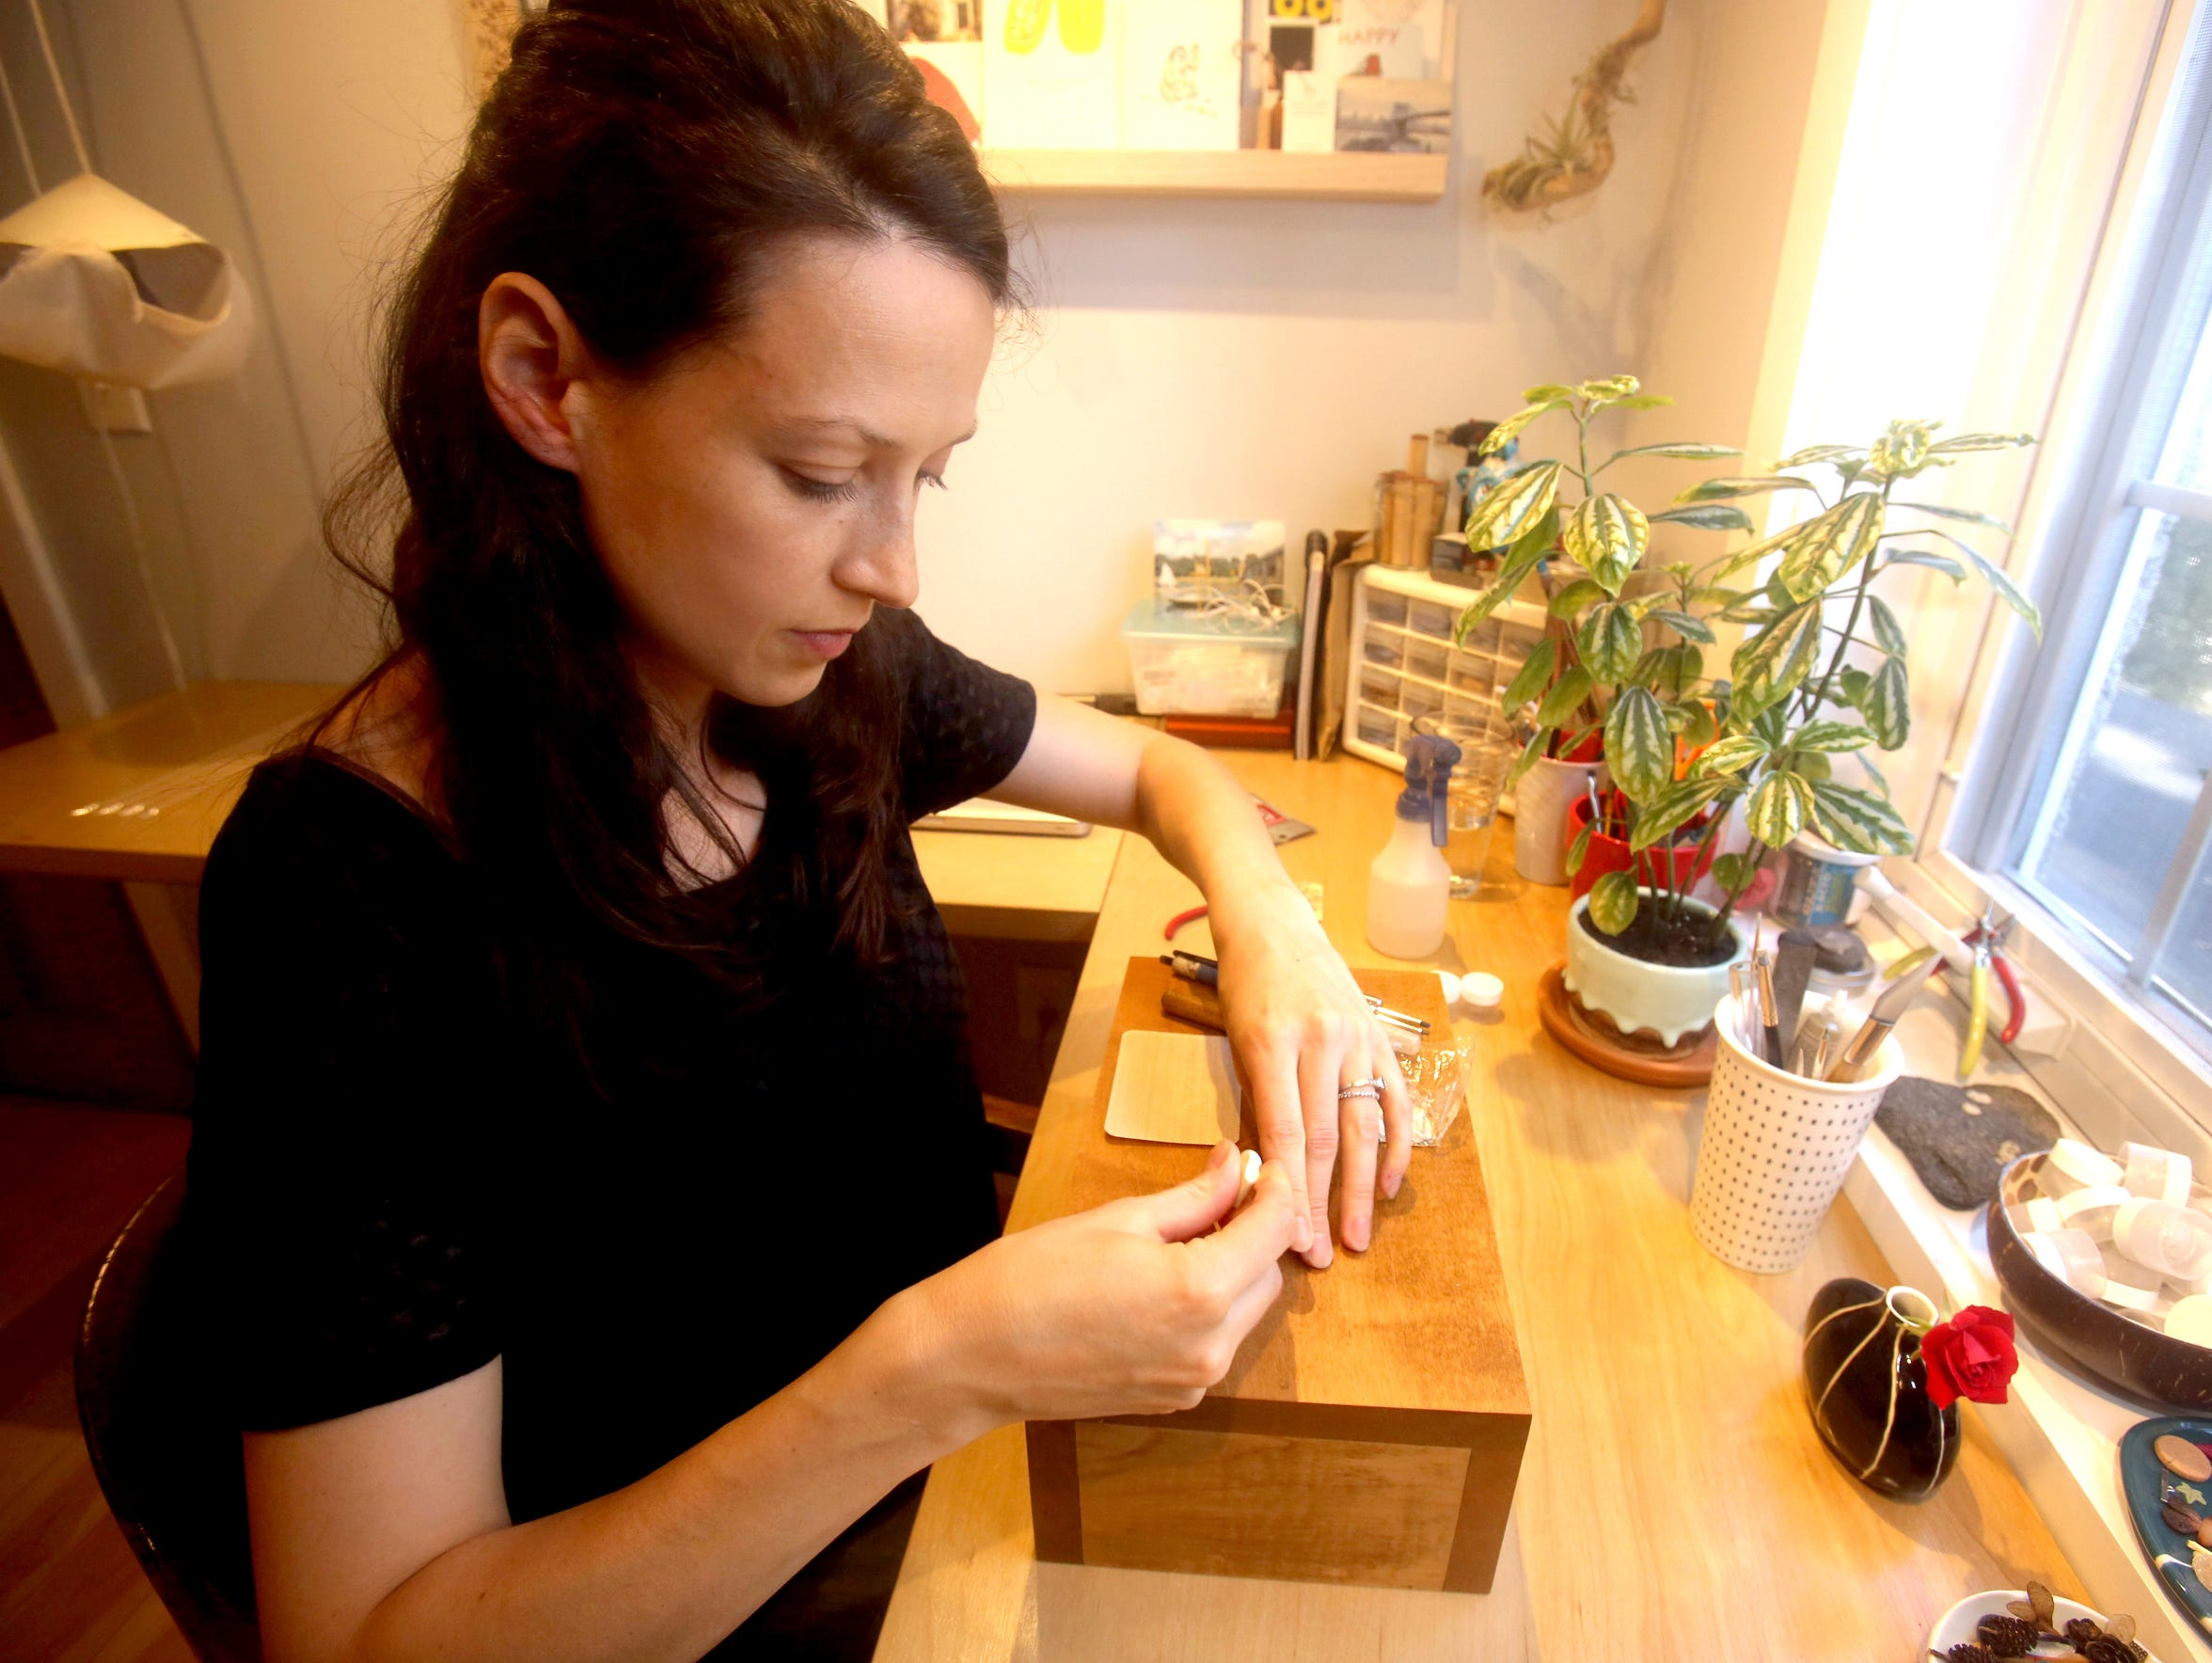 Jewelry maker Caitlin McNamara works in her home studio